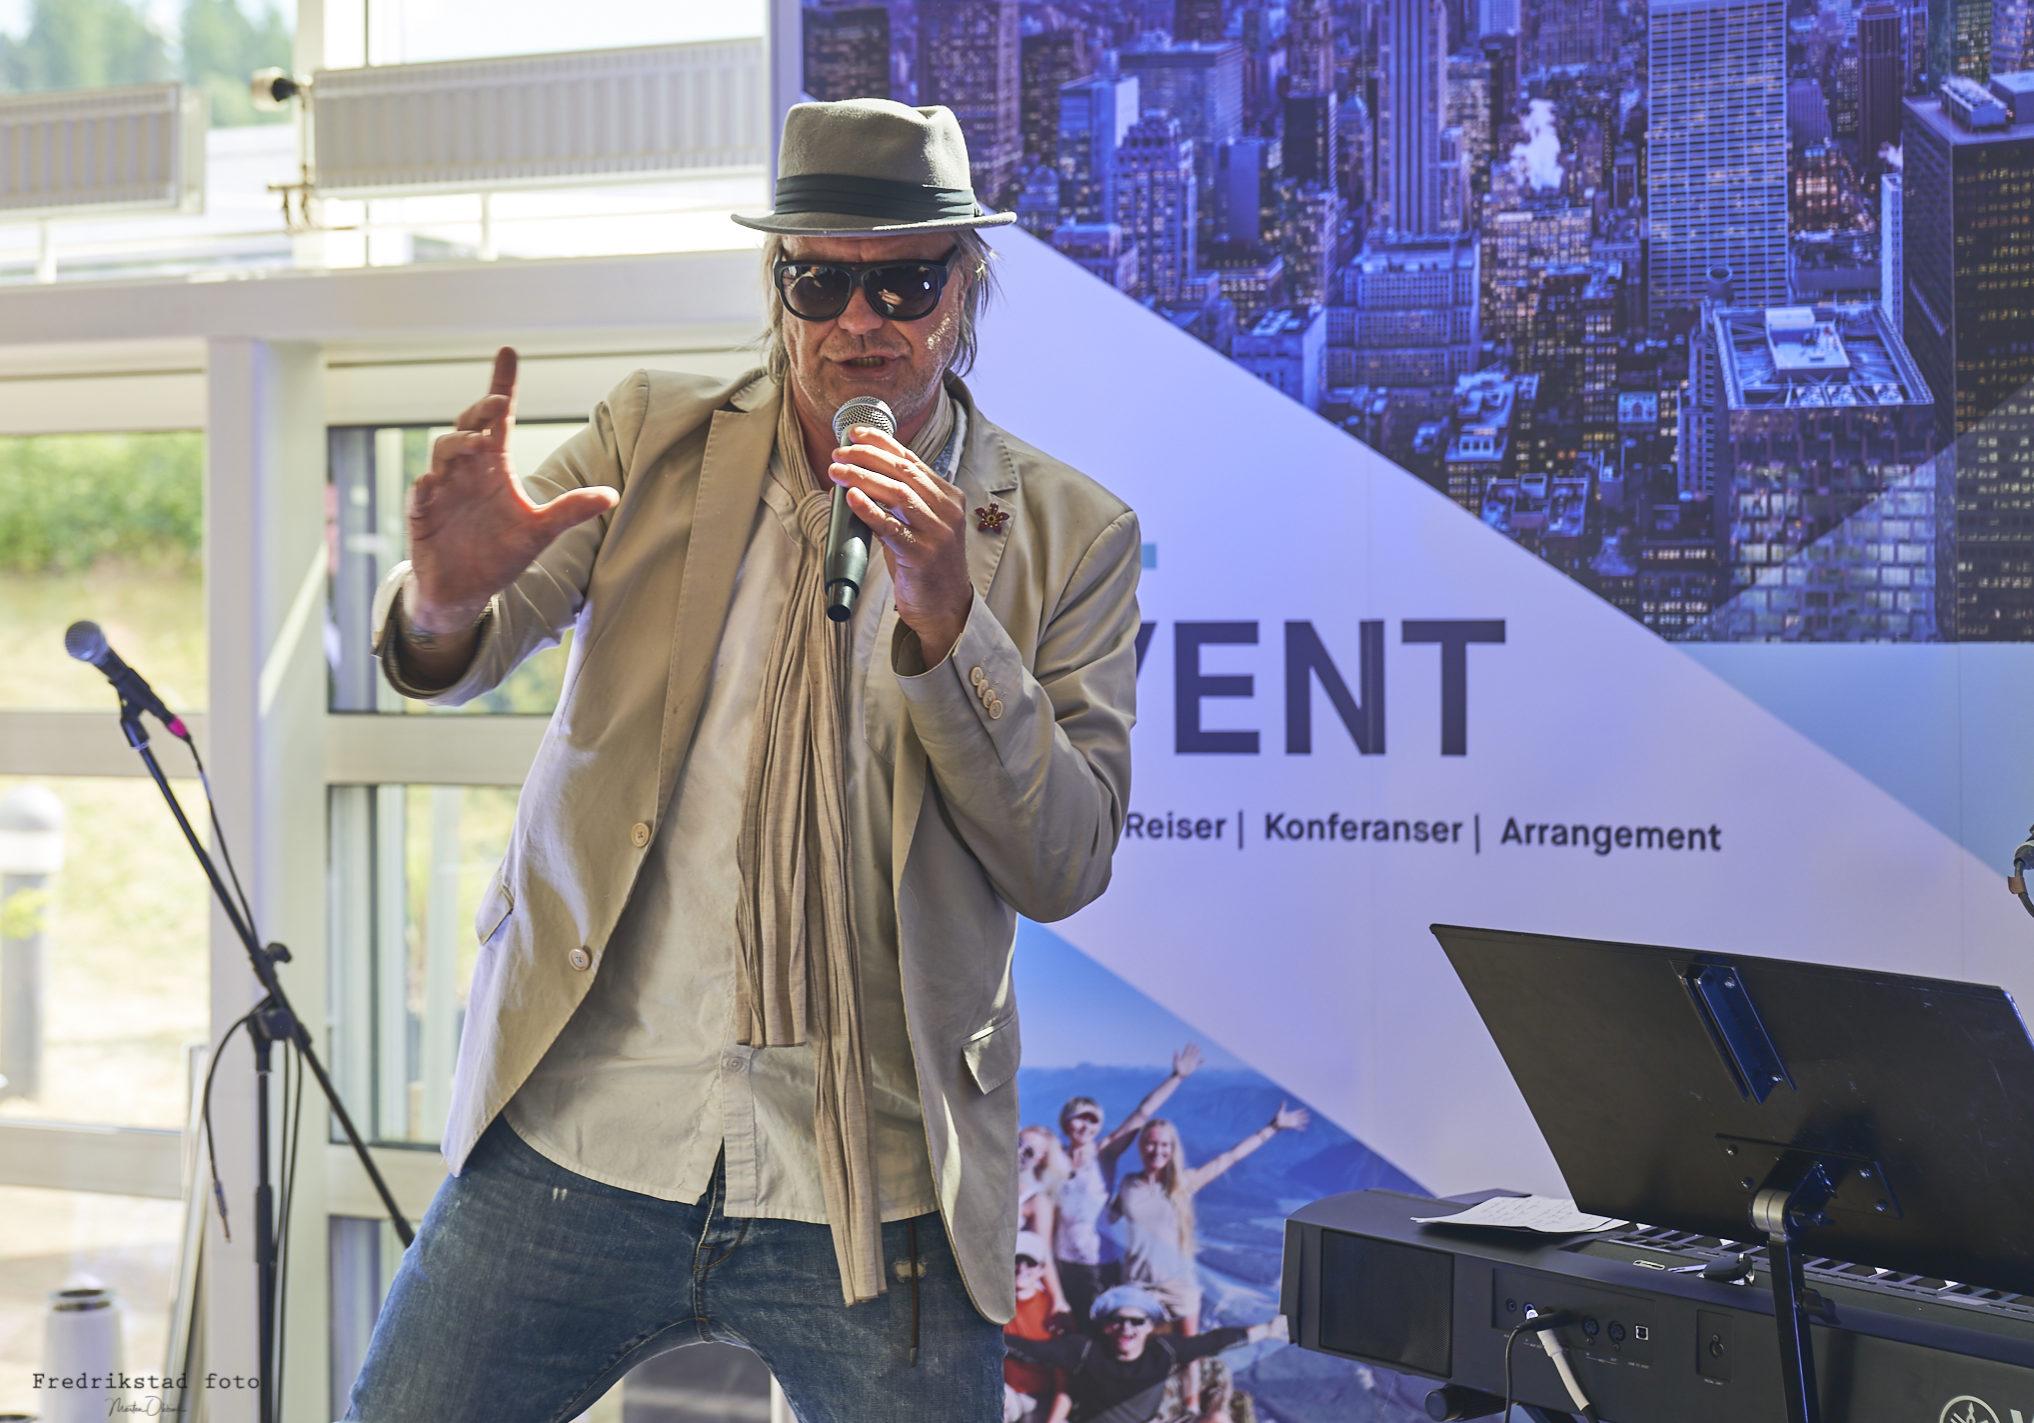 Konferansier Alex Ròsen, firmafest, firma arrangement, lanseringsfest, underholdning